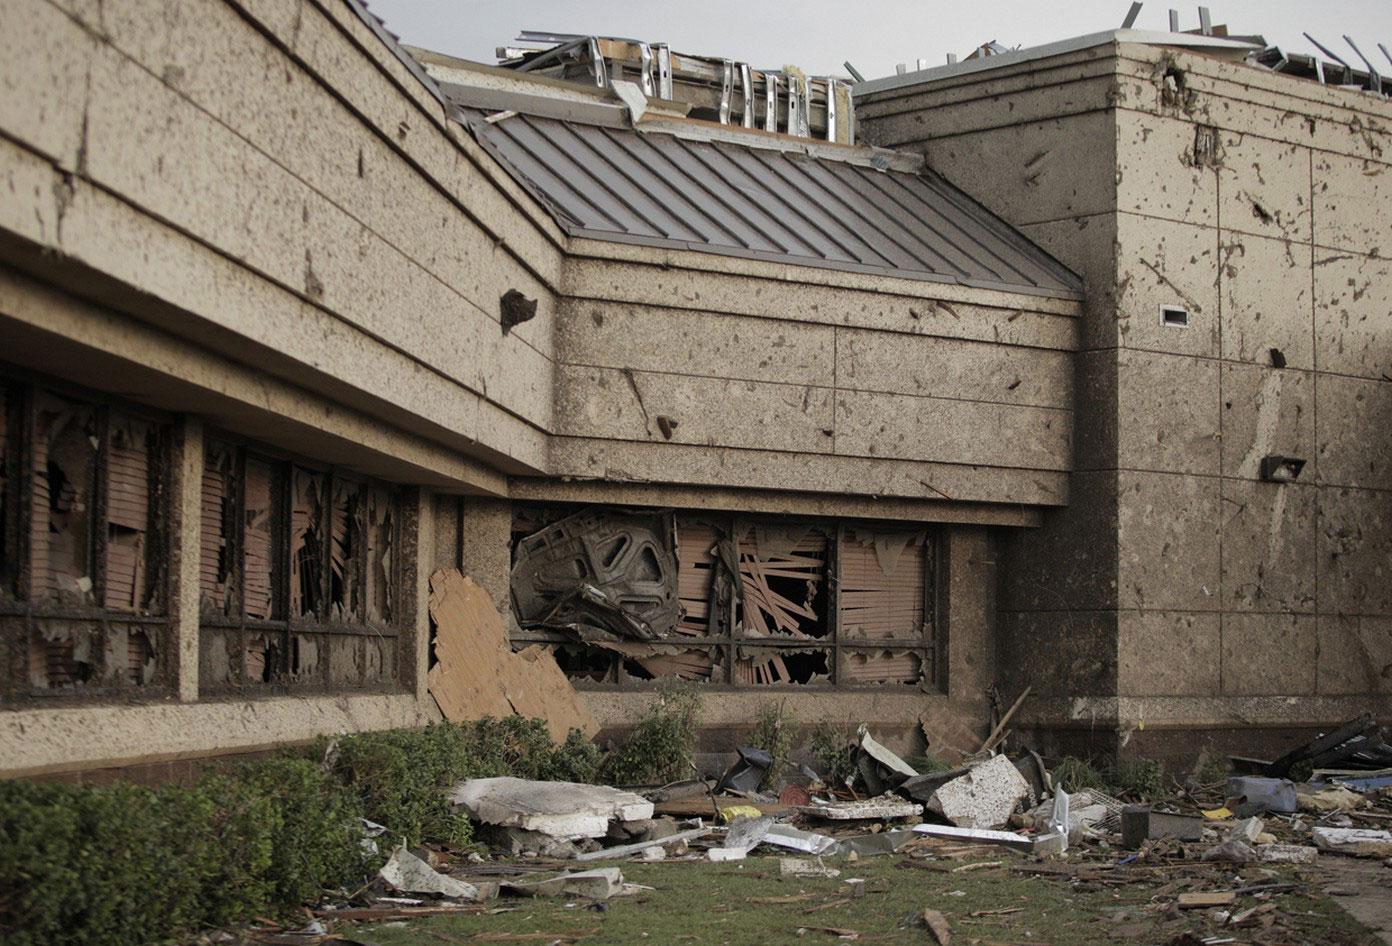 разрушения у медицинского центра в США